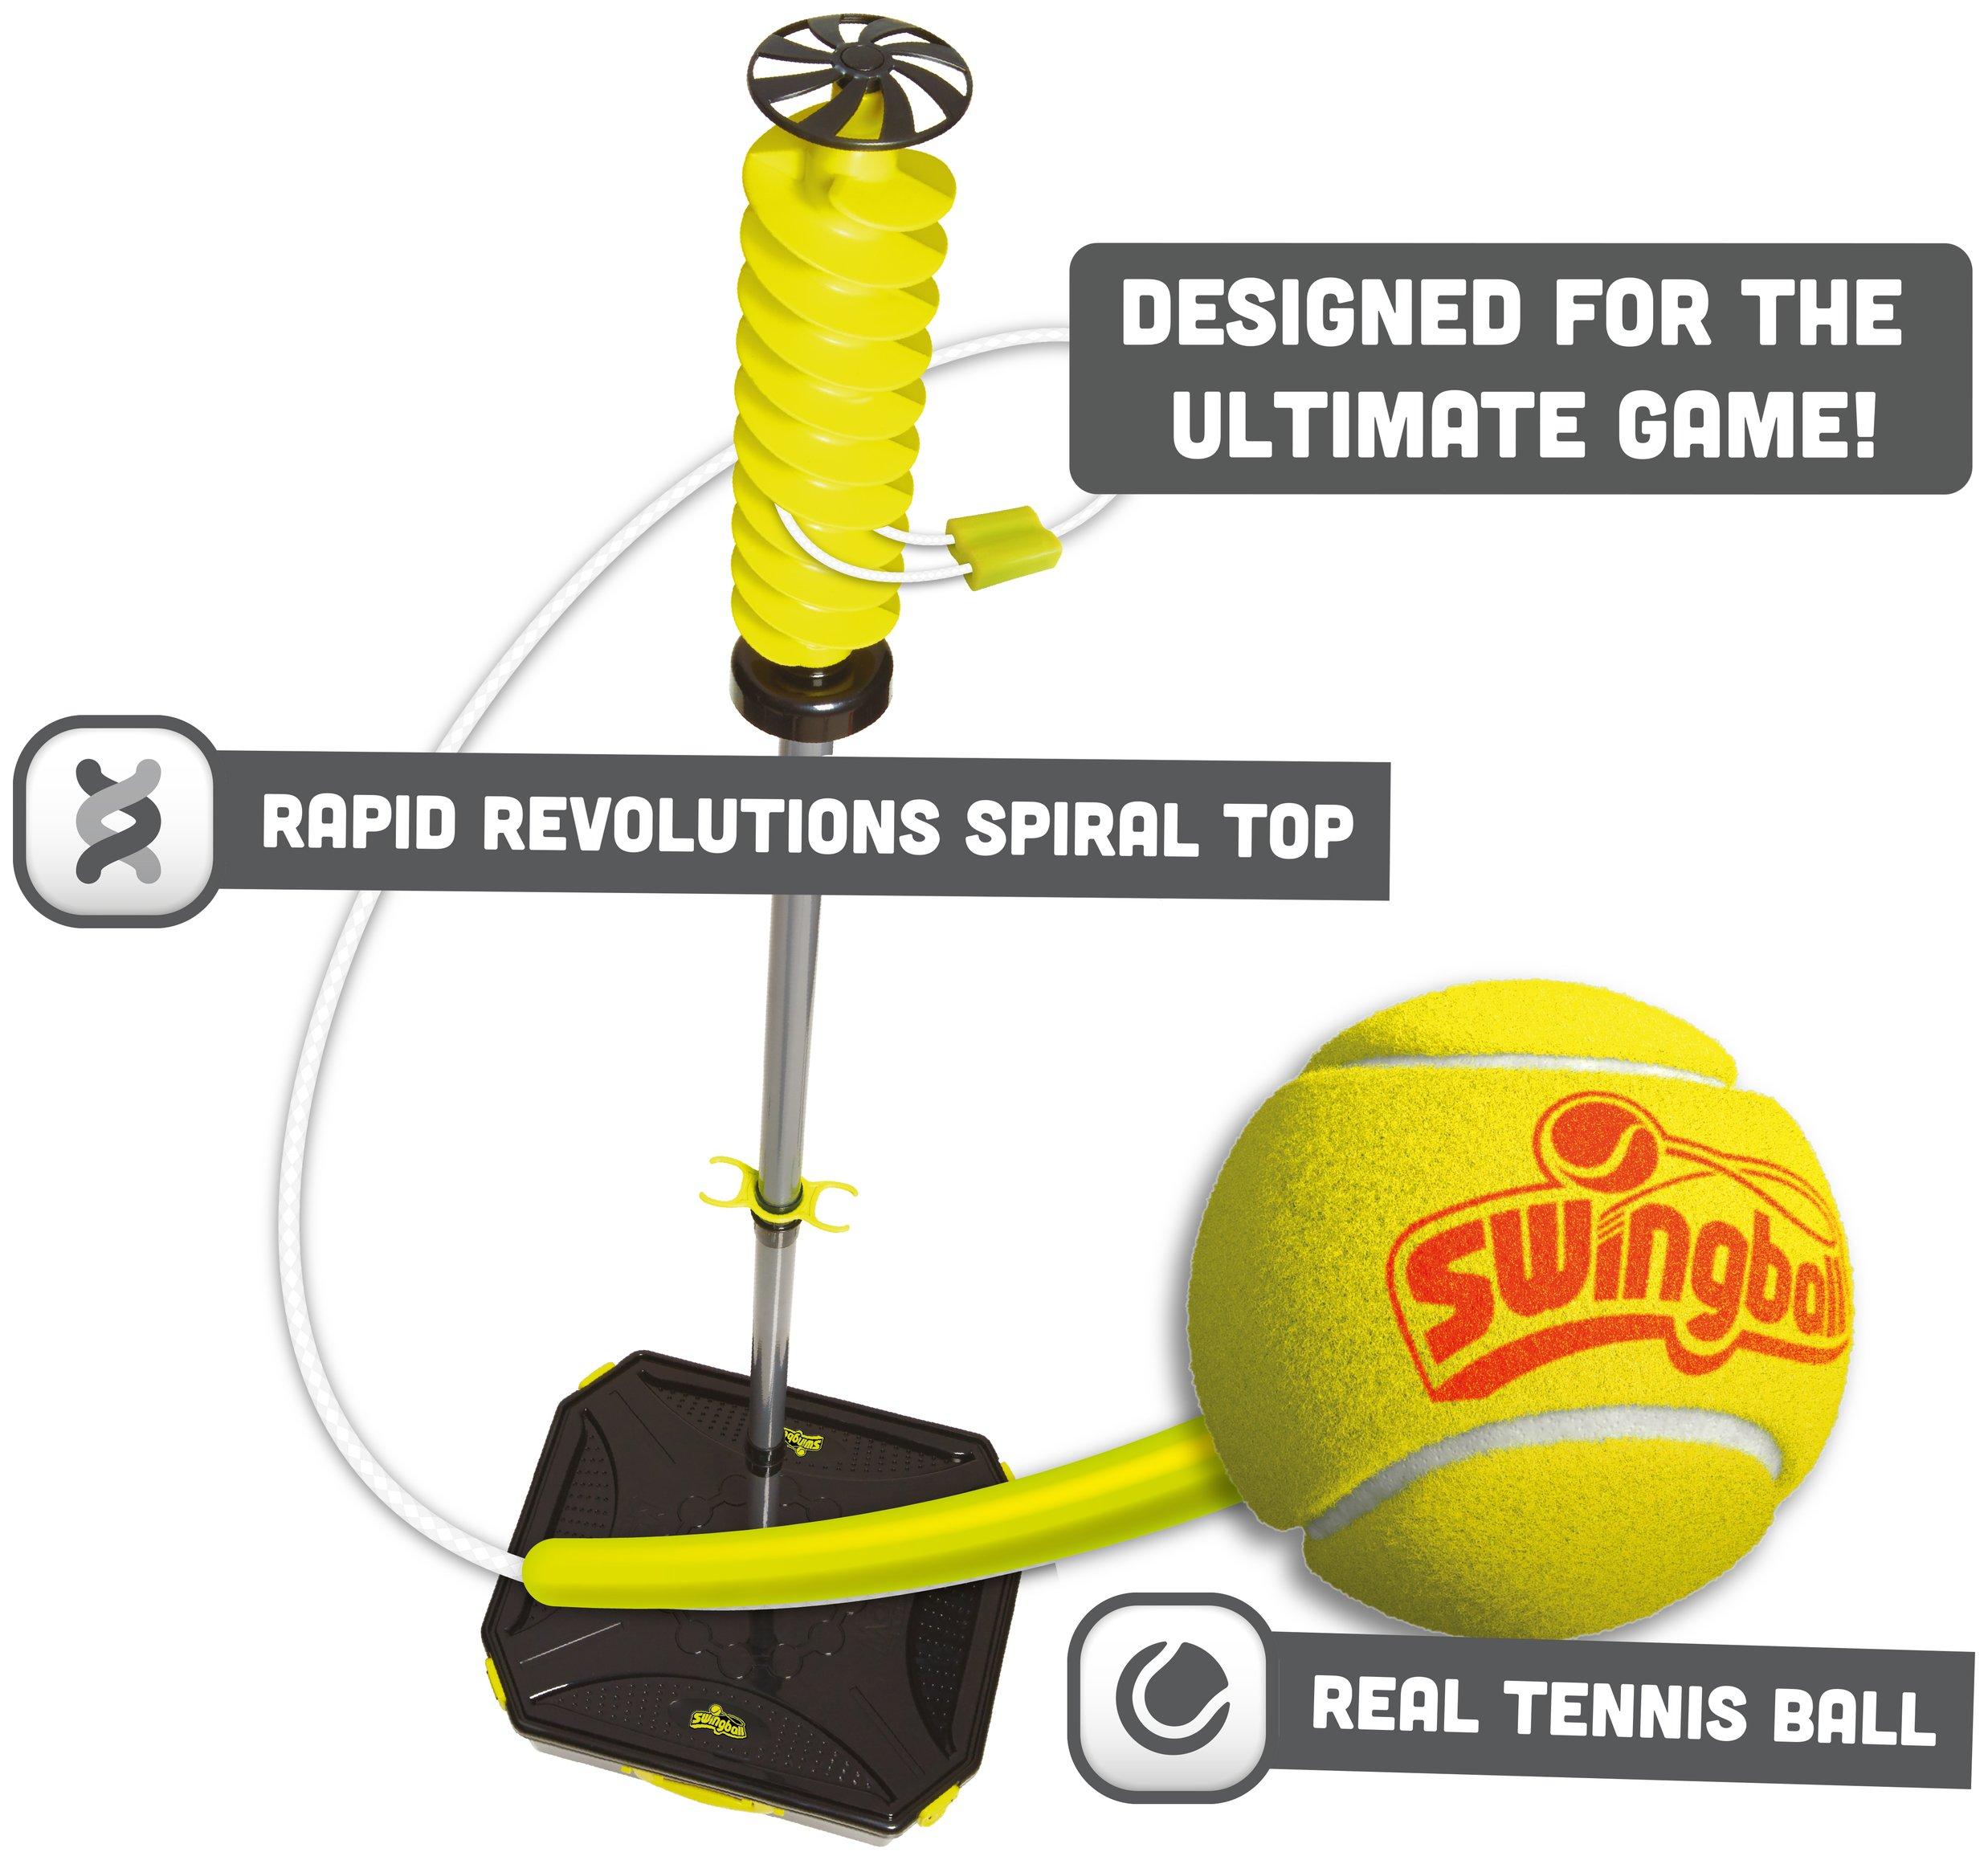 Balance Ball Argos: Swingball. Now Available